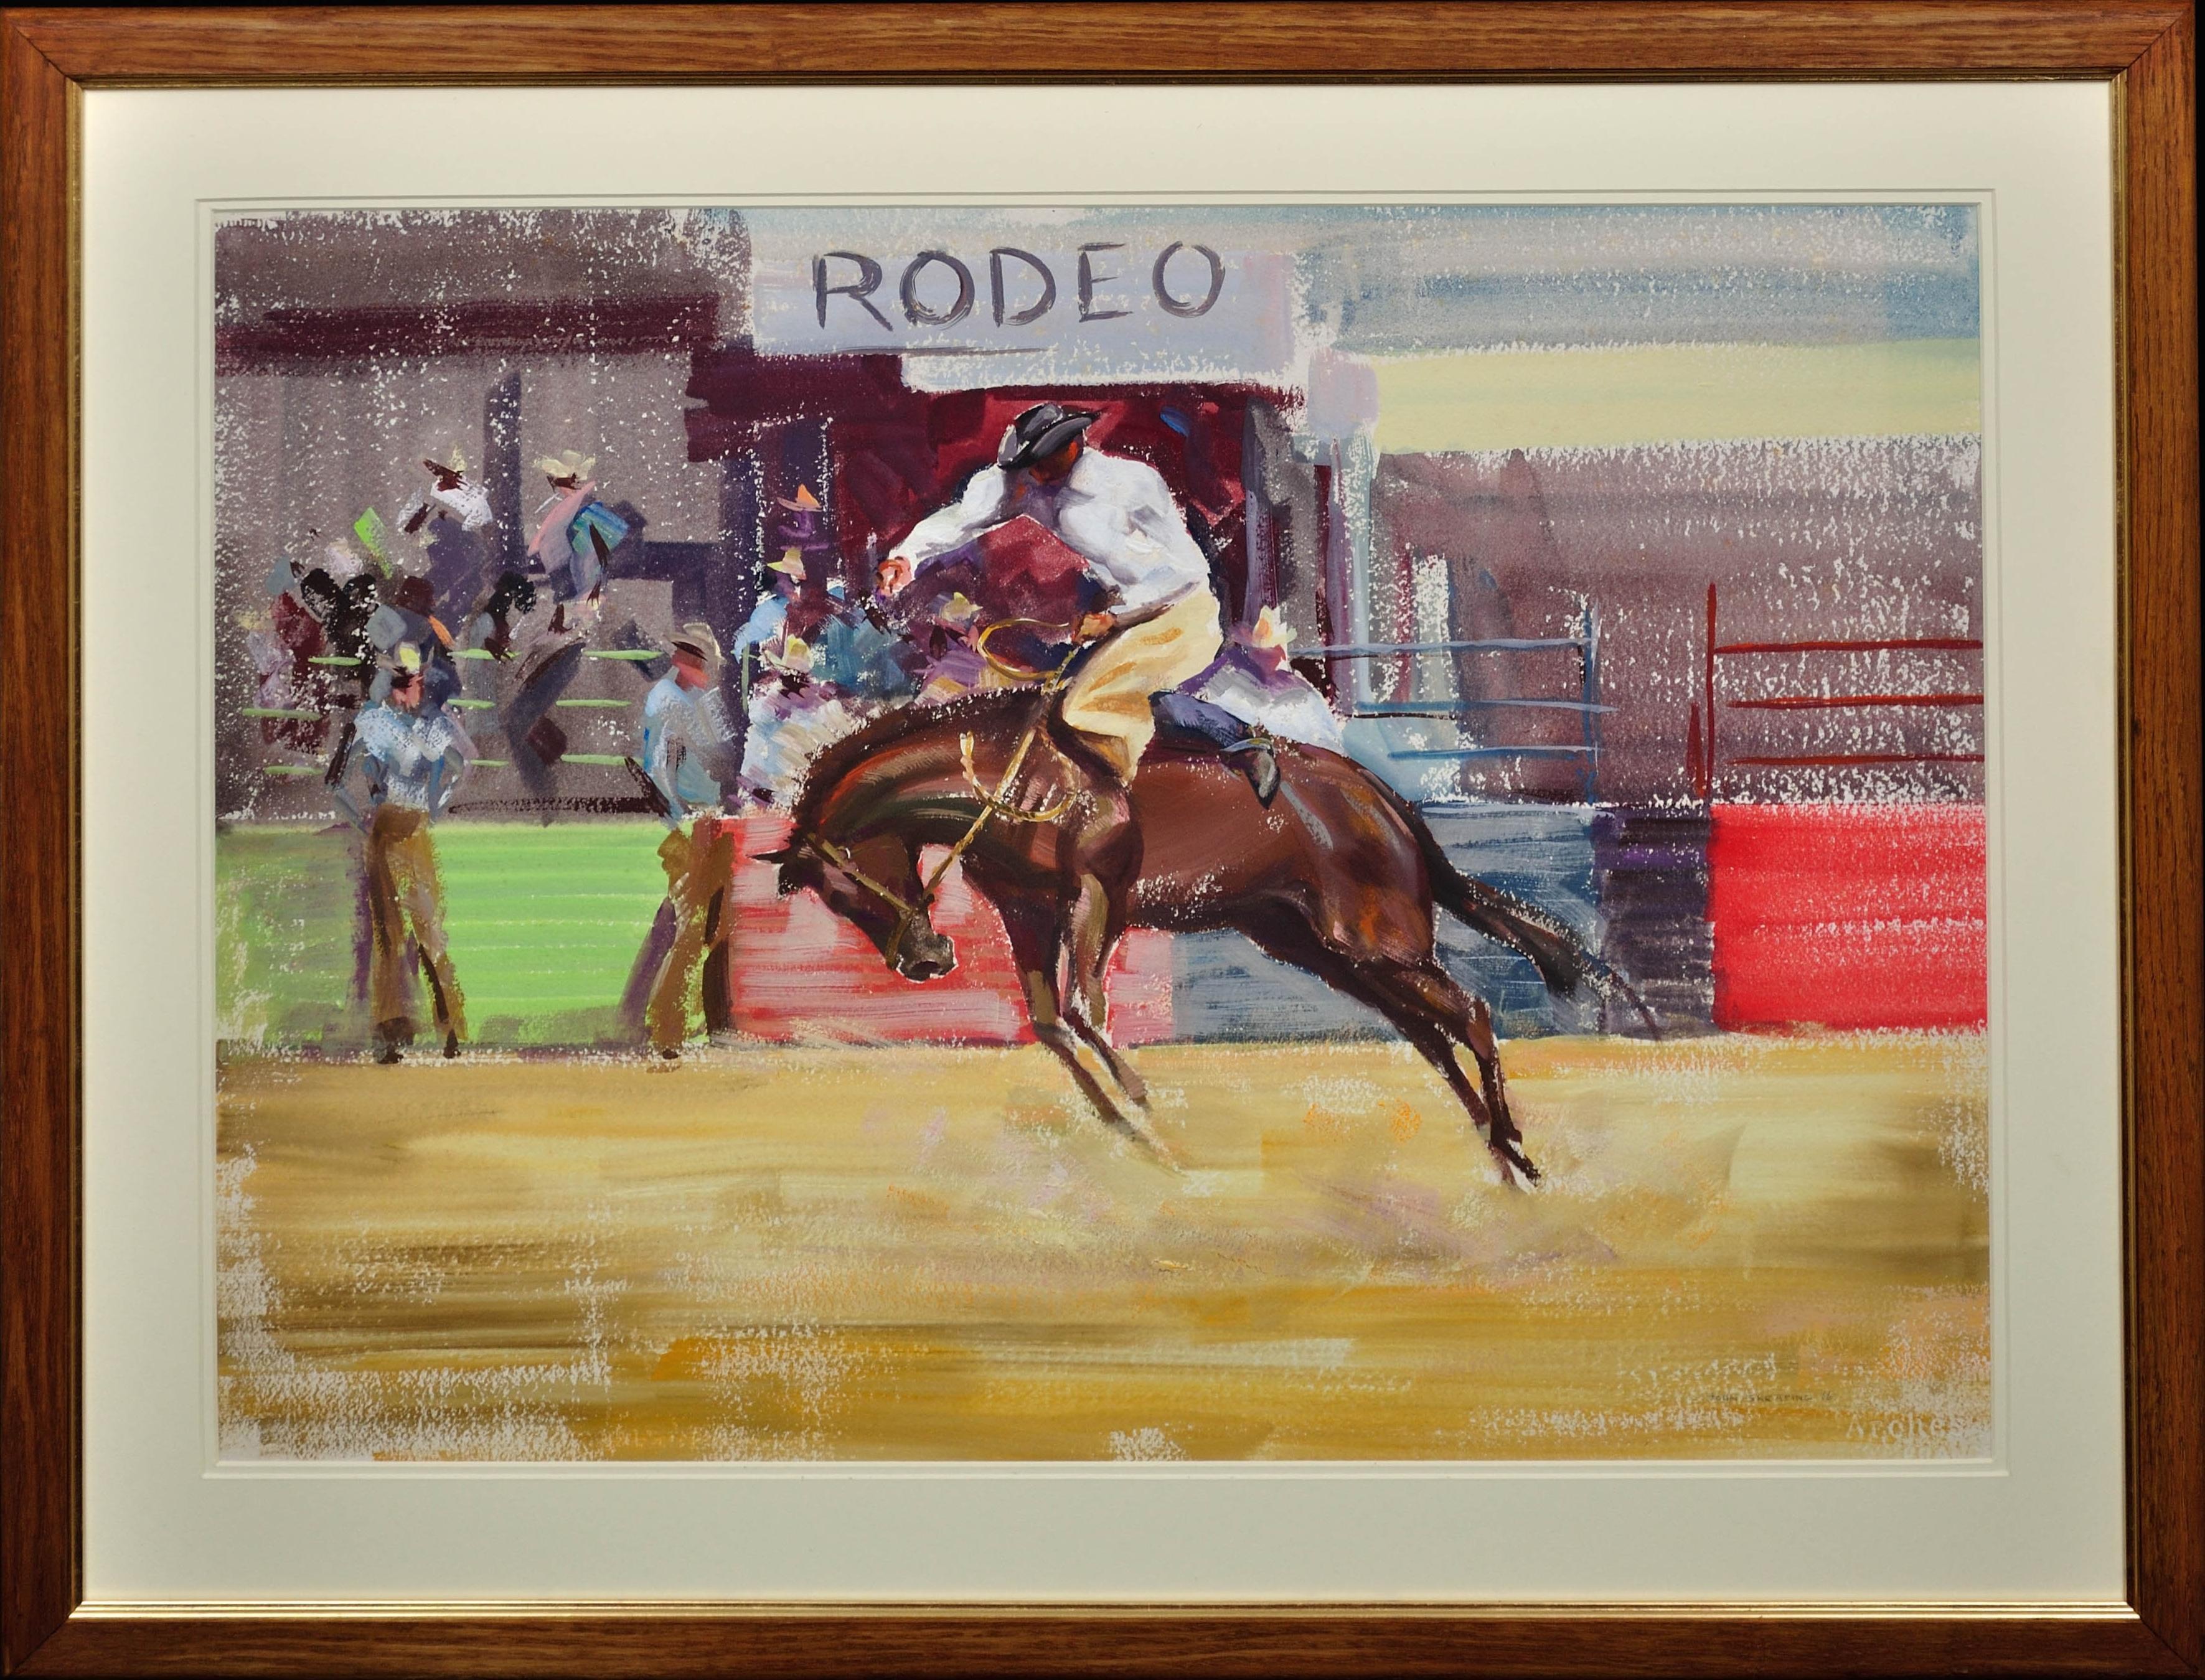 Rodeo. Bareback Bronco. Mid 20th Century. 1966. Western Cowboy Ranch Equestrian.